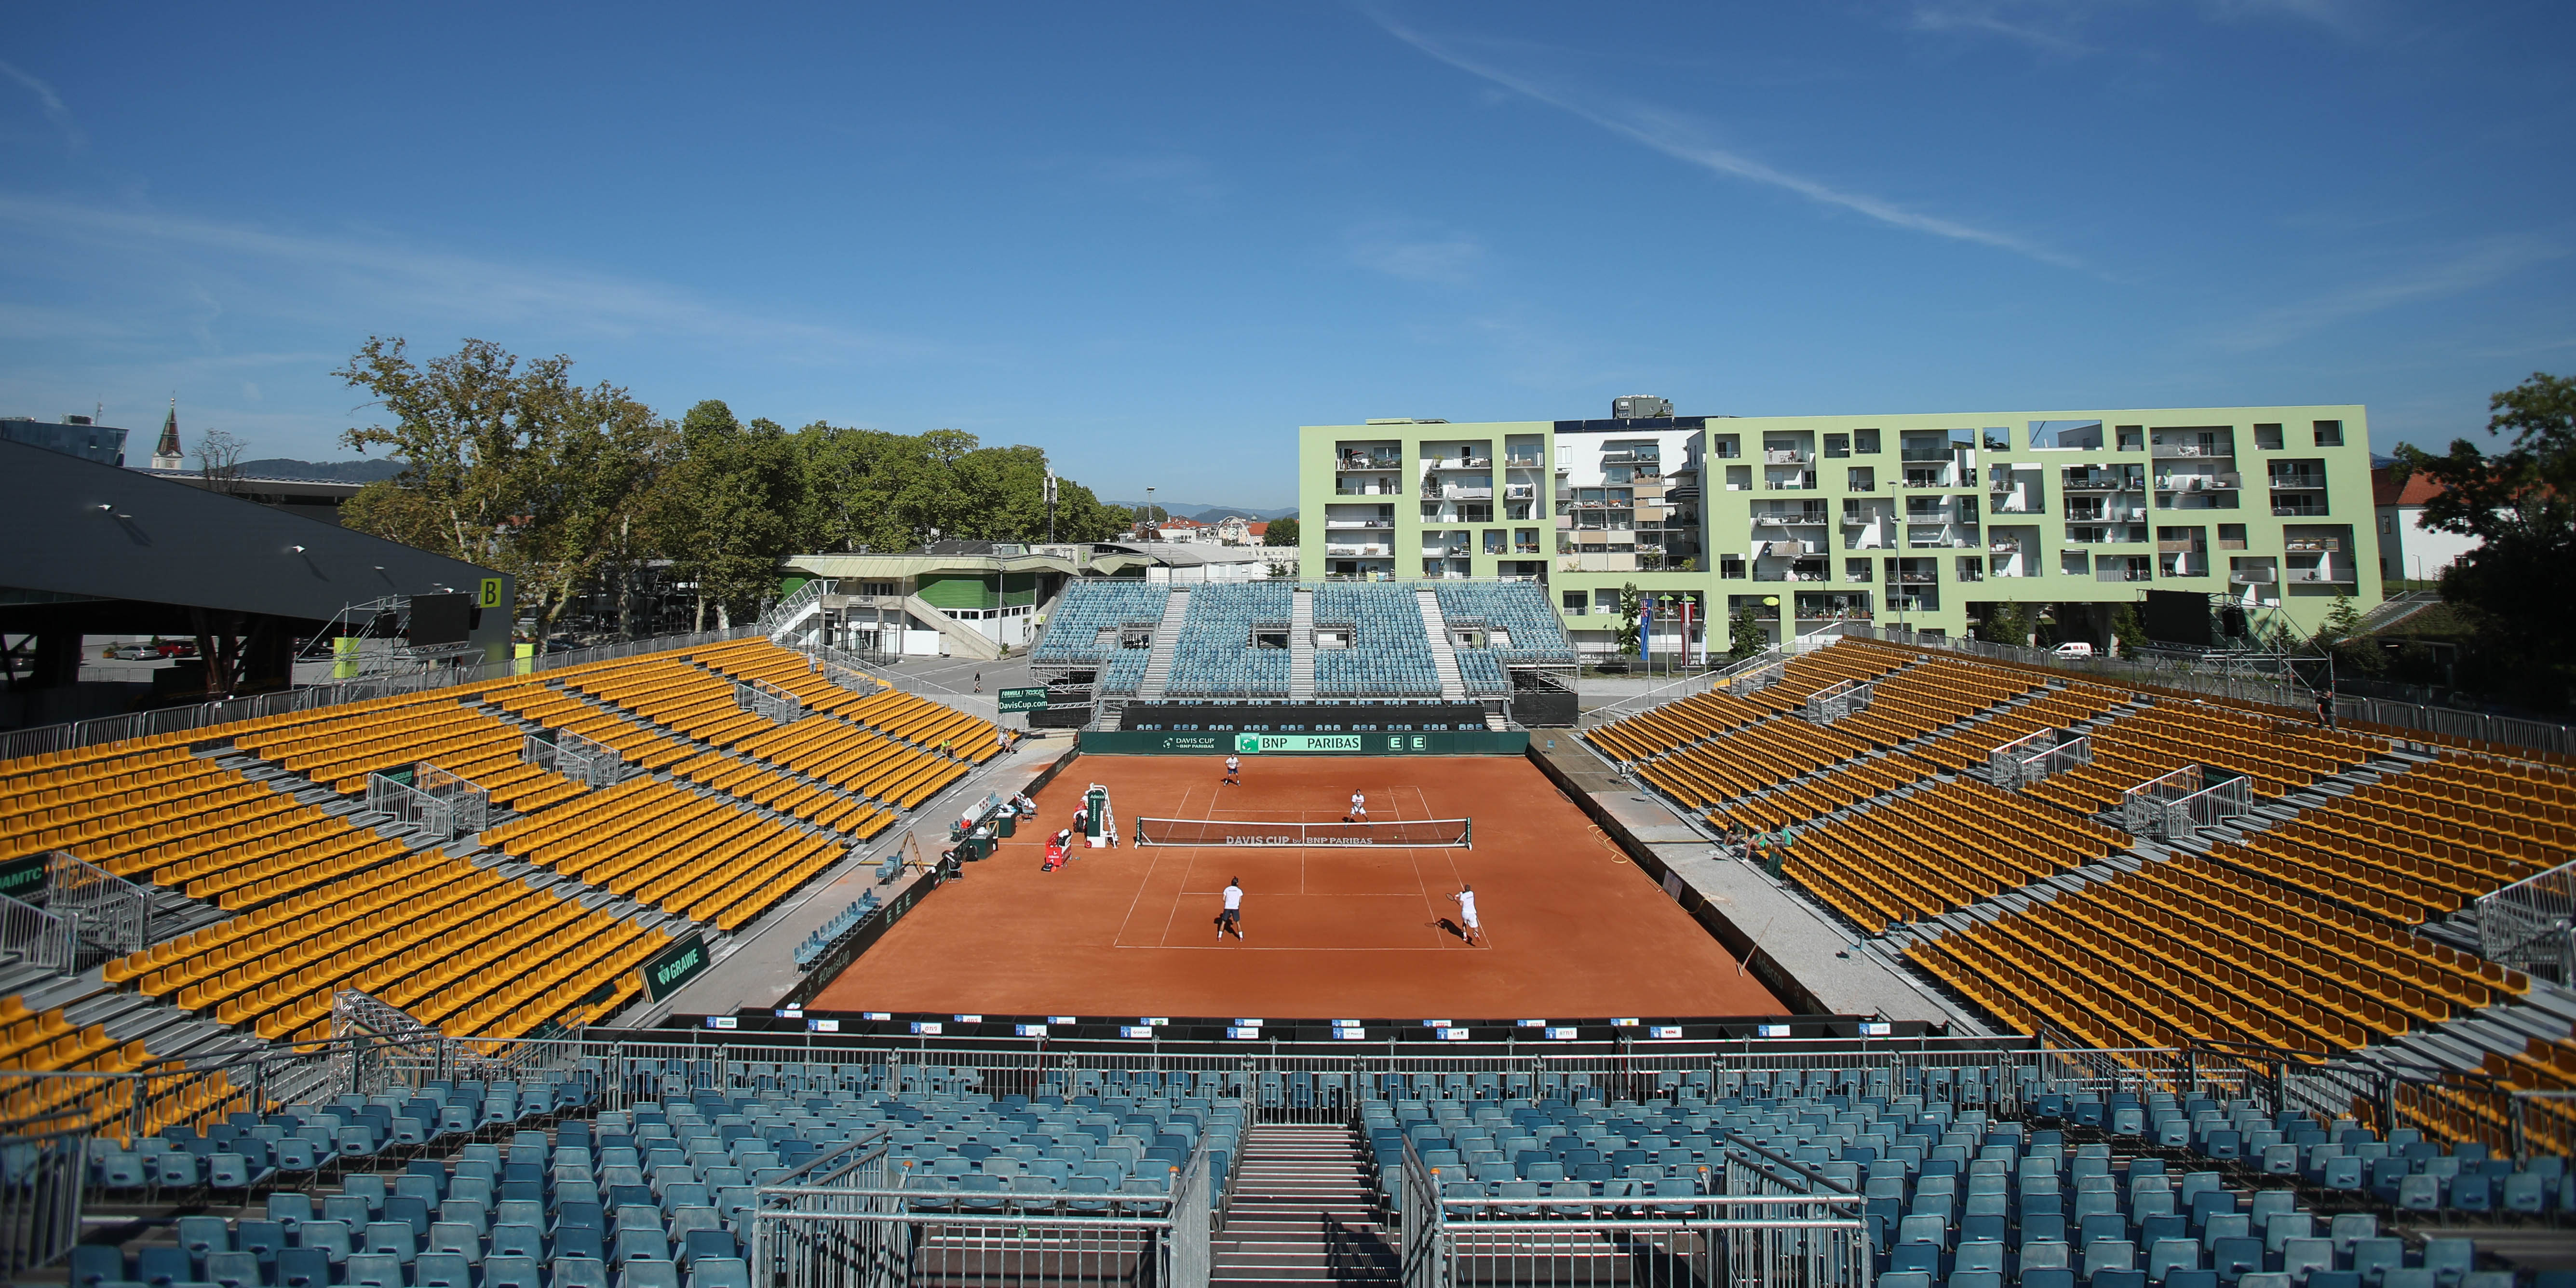 Tennisstadion, Graz, Davis Cup